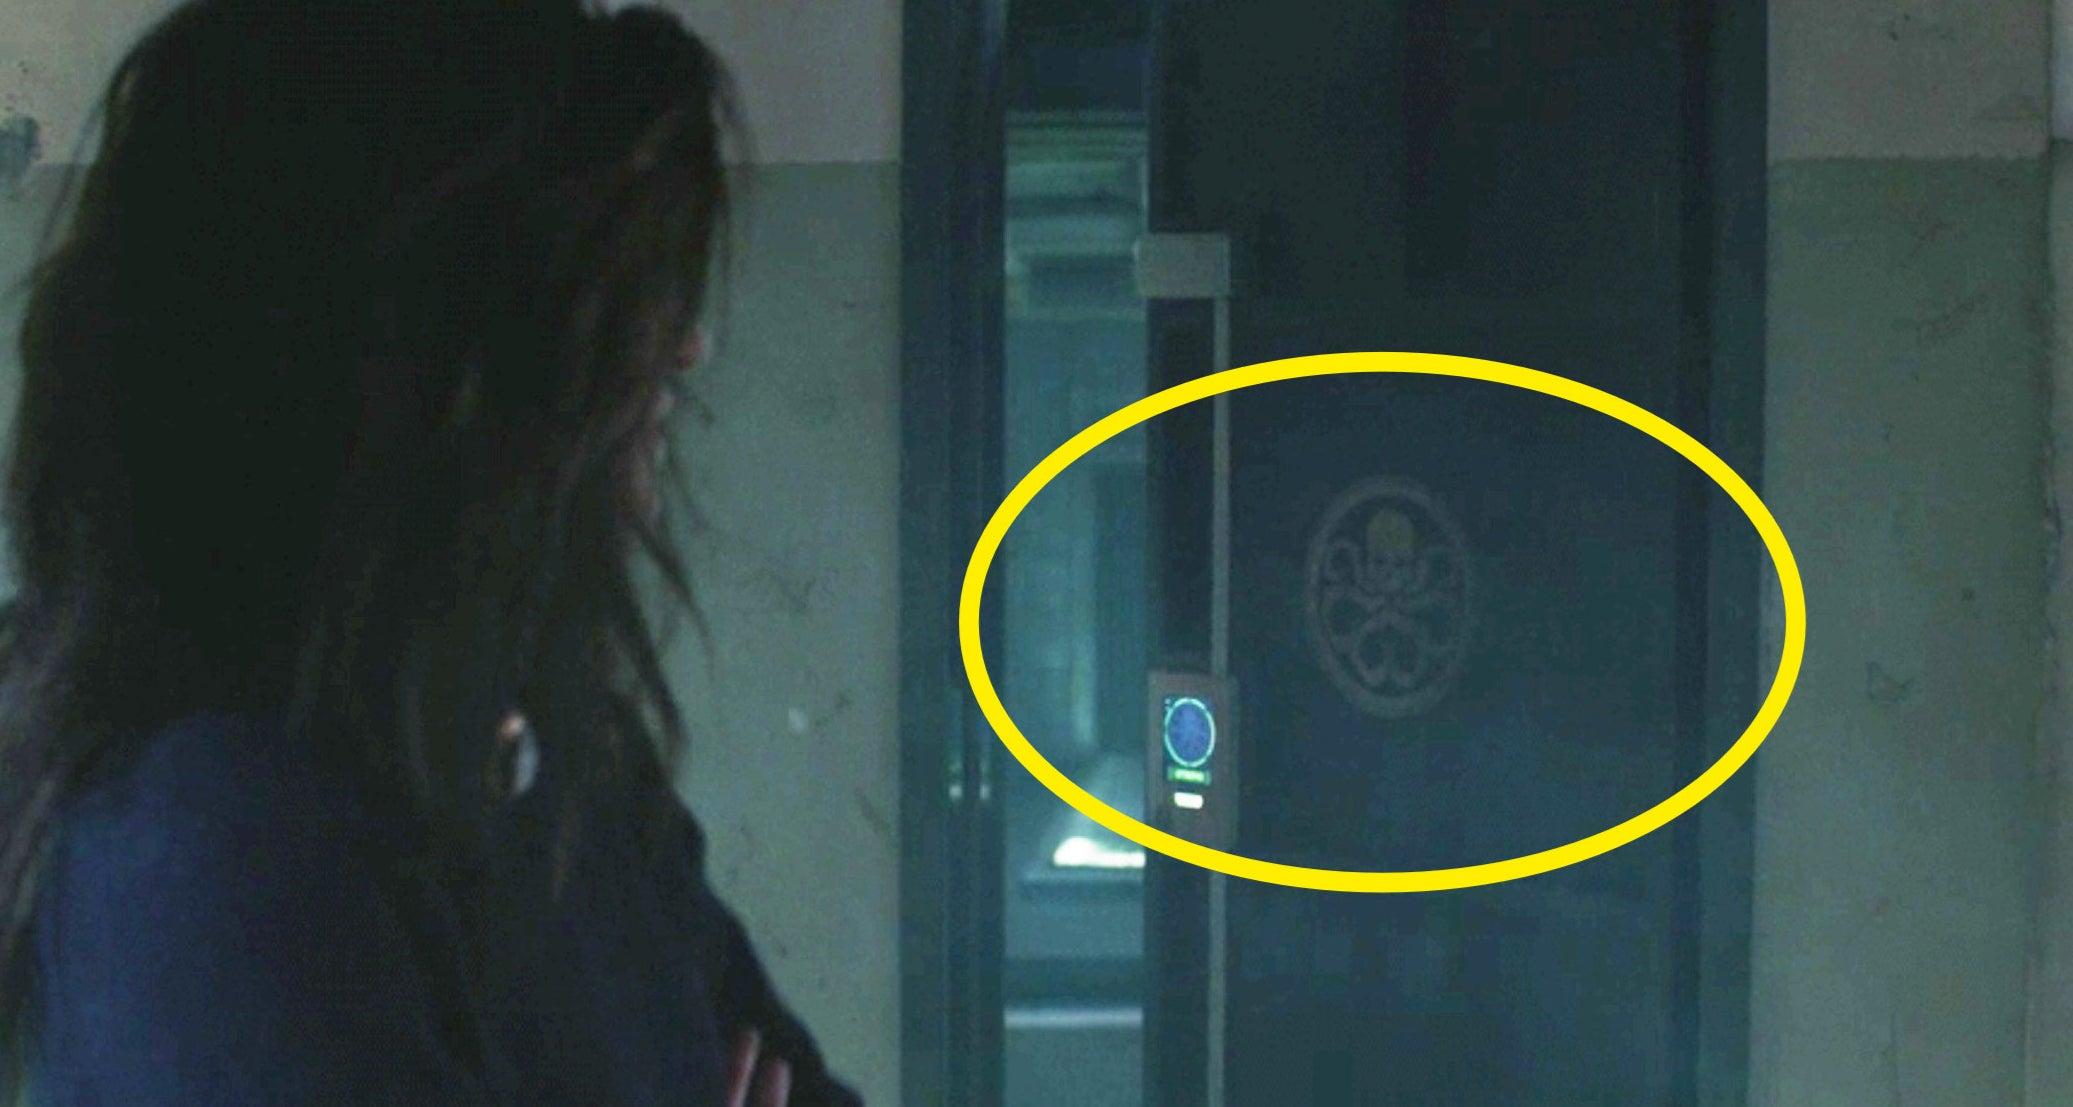 A circle around the HYDRA logo on a door